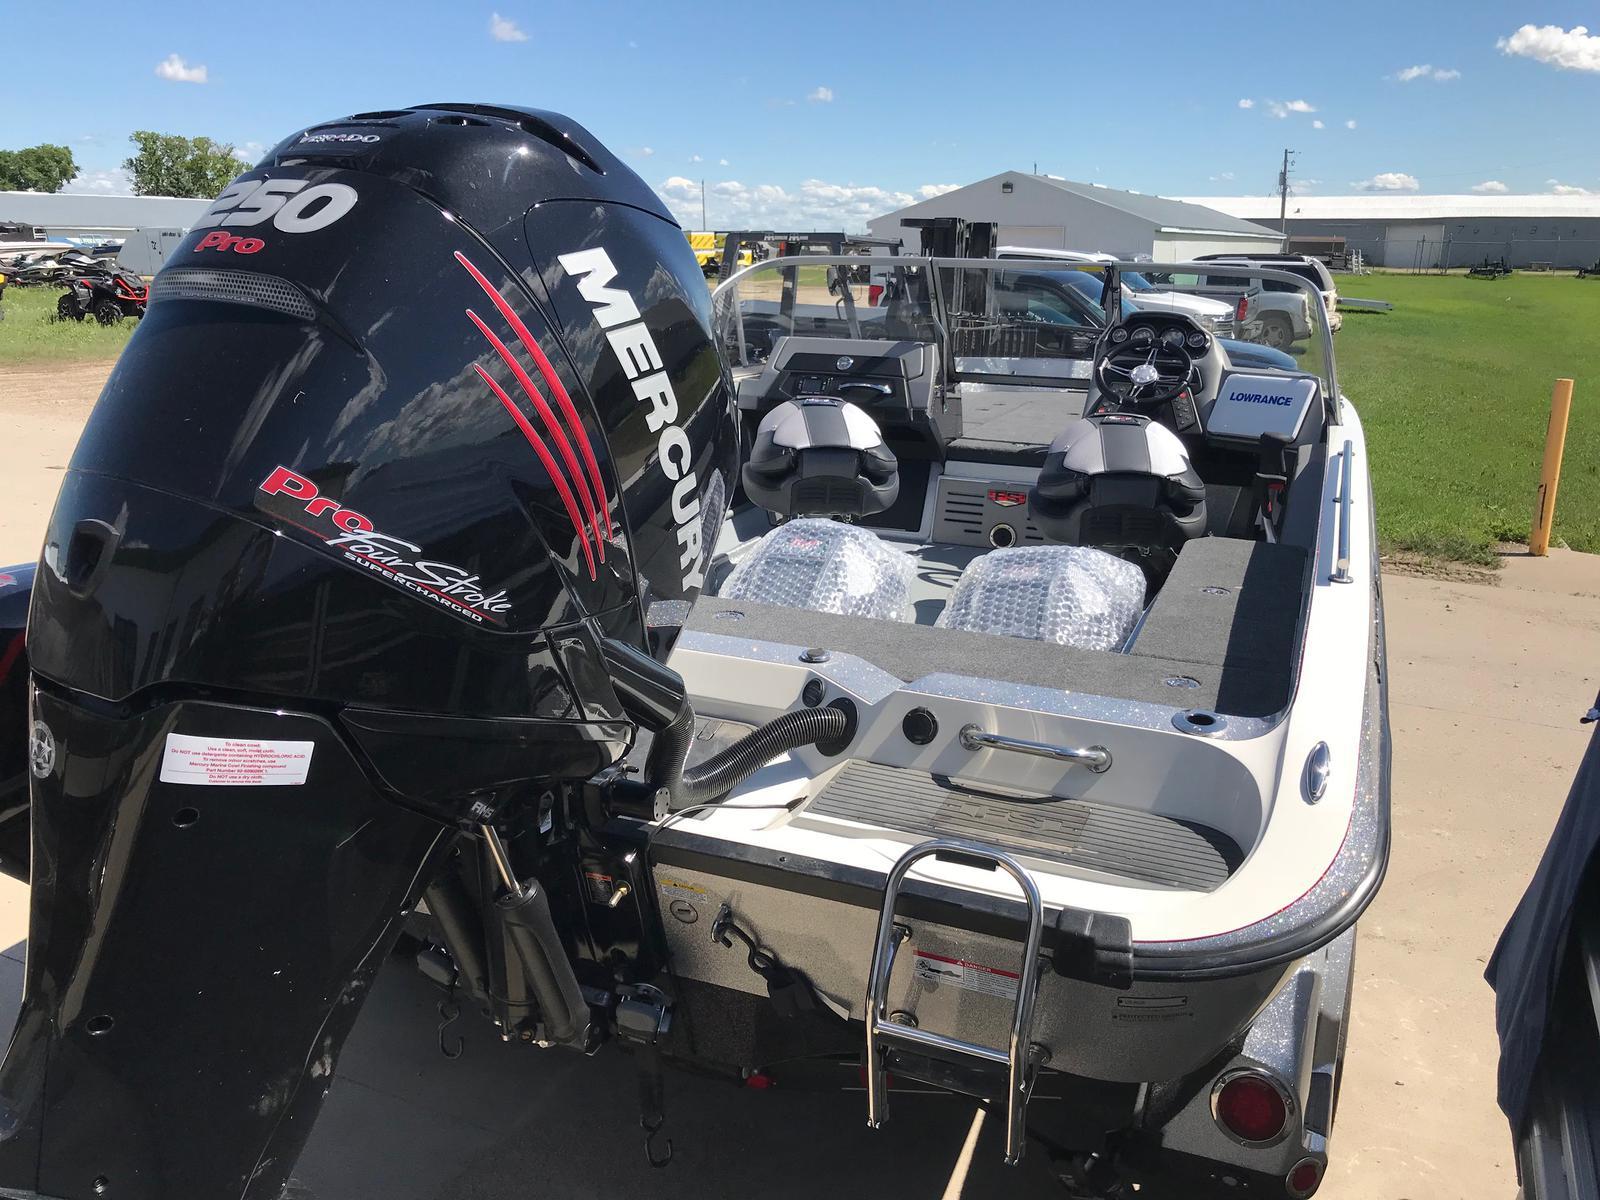 2018 Ranger 620fs Cup W Mercury V250xl Pro Verado For Sale In Wiring Harness Img 4856